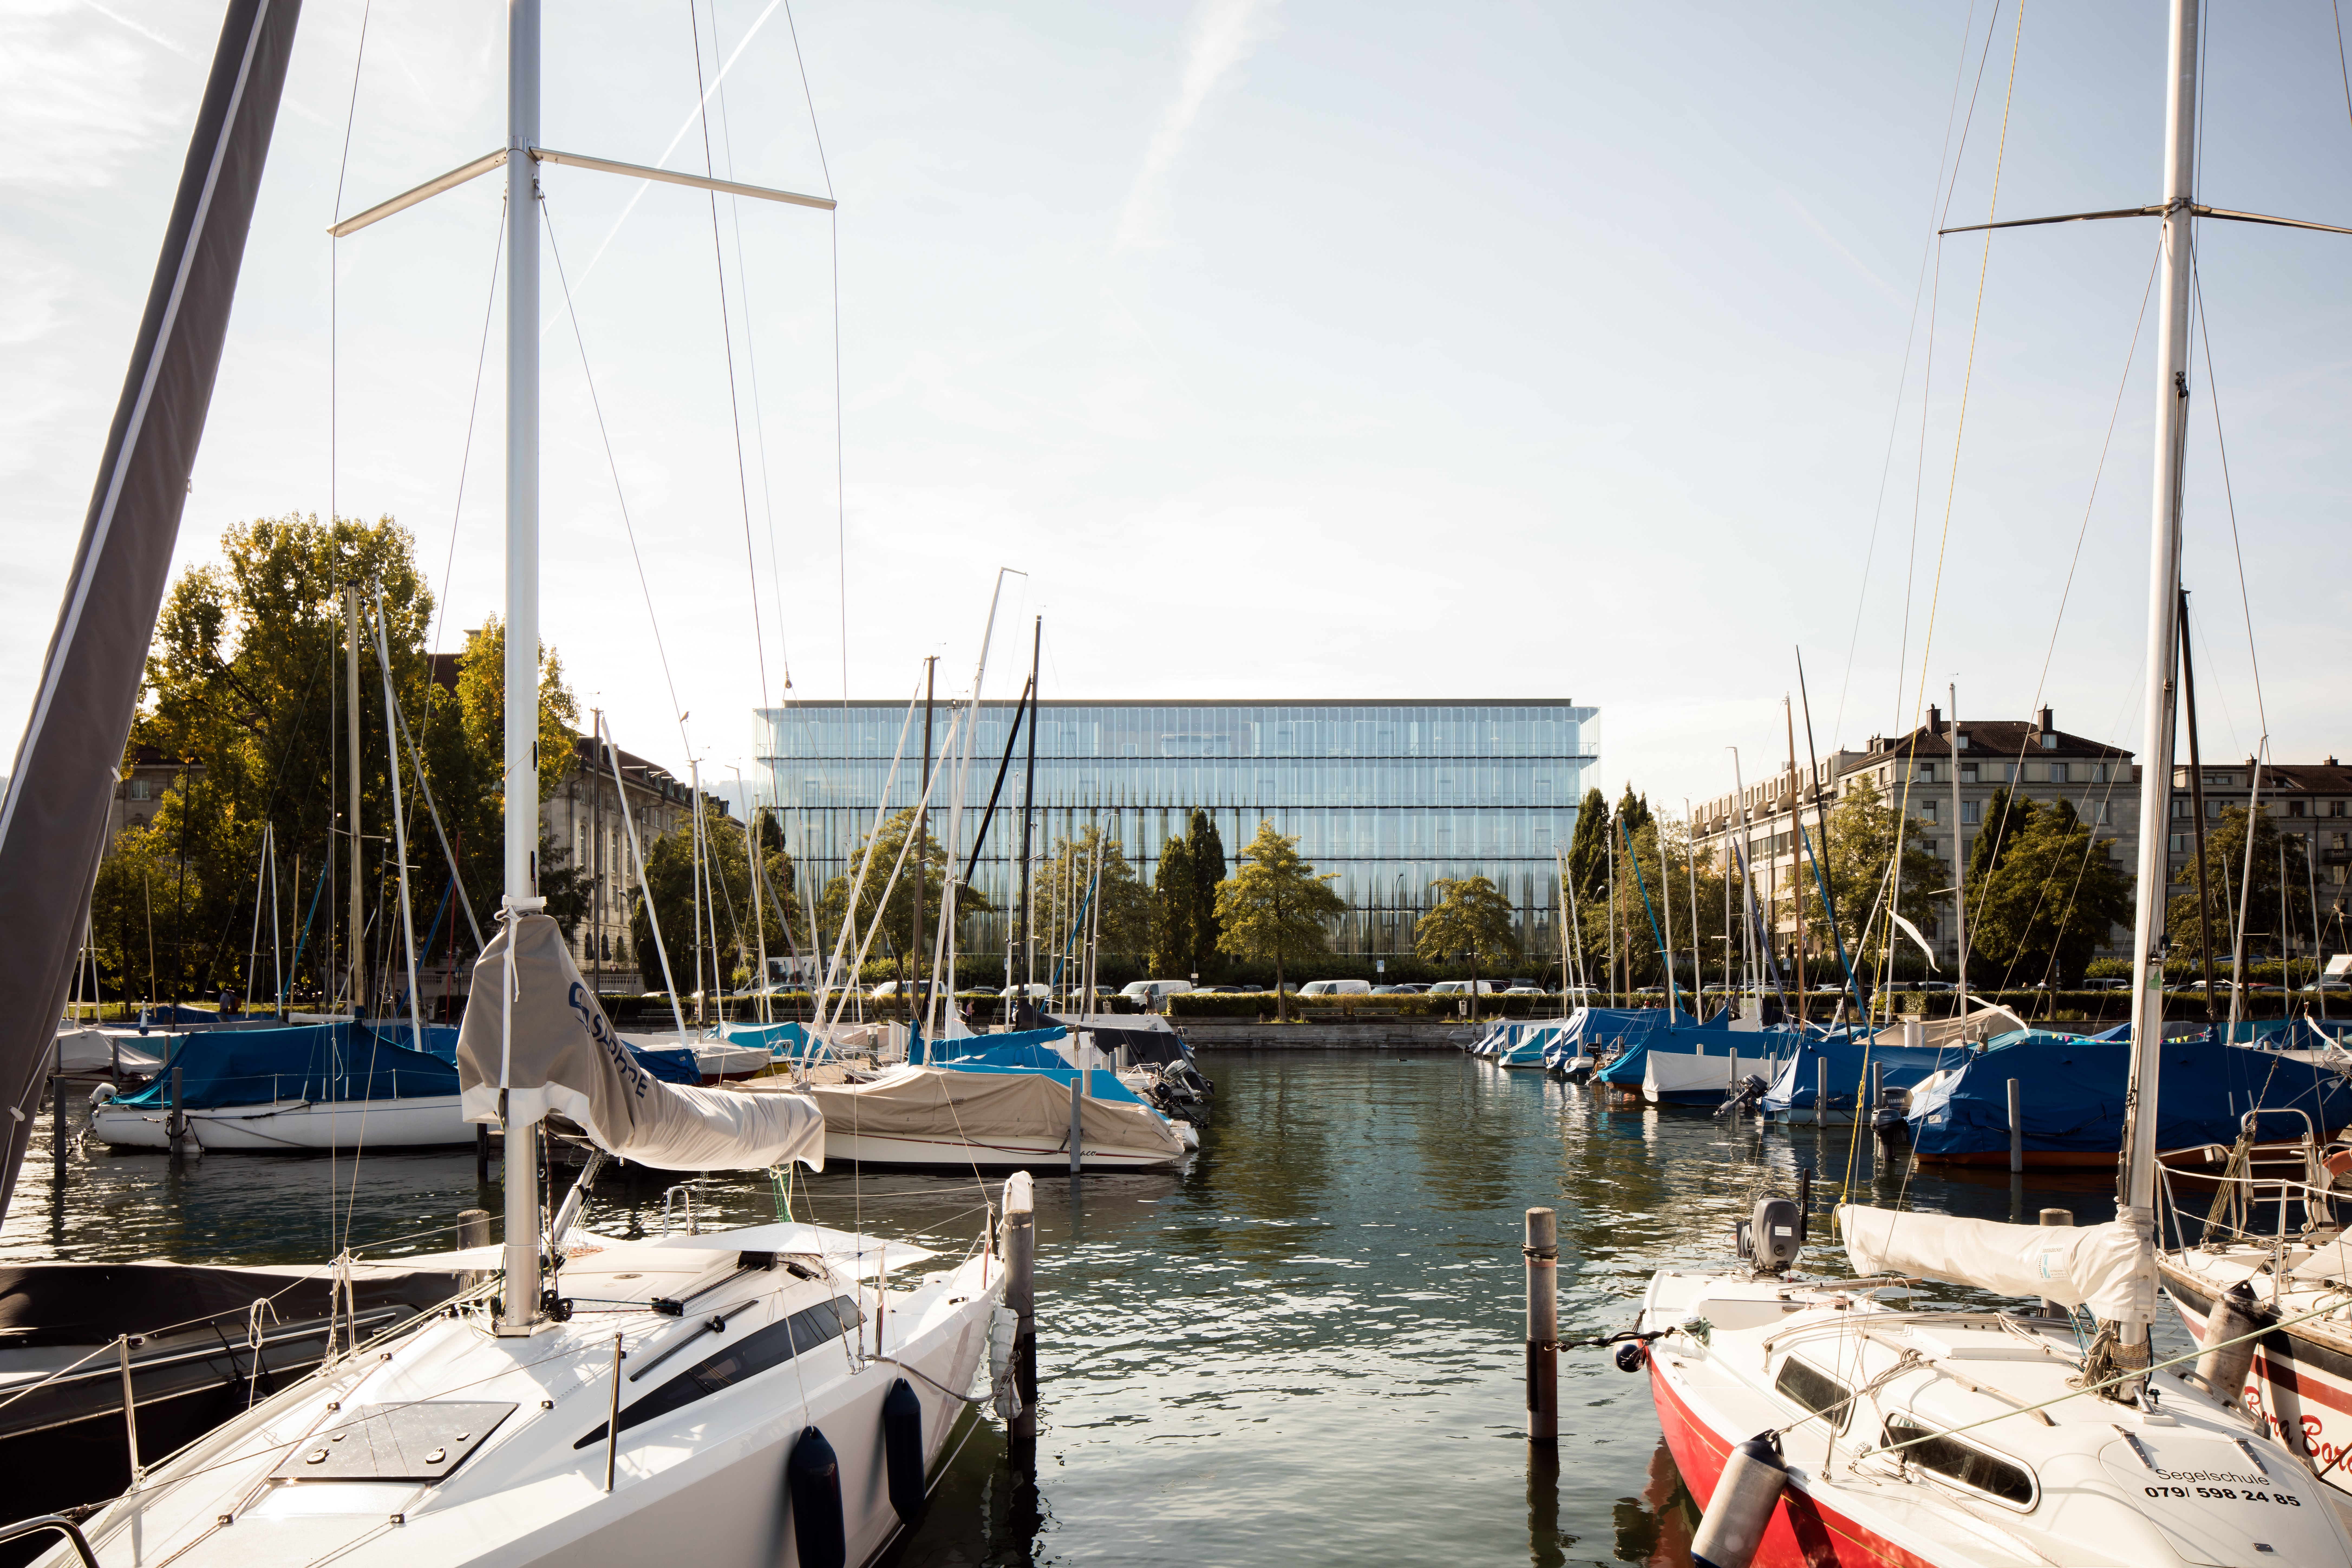 <p>Swiss Re Next gezien vanuit 'Hafen Enge'. Beeld: Christian Richters</p>